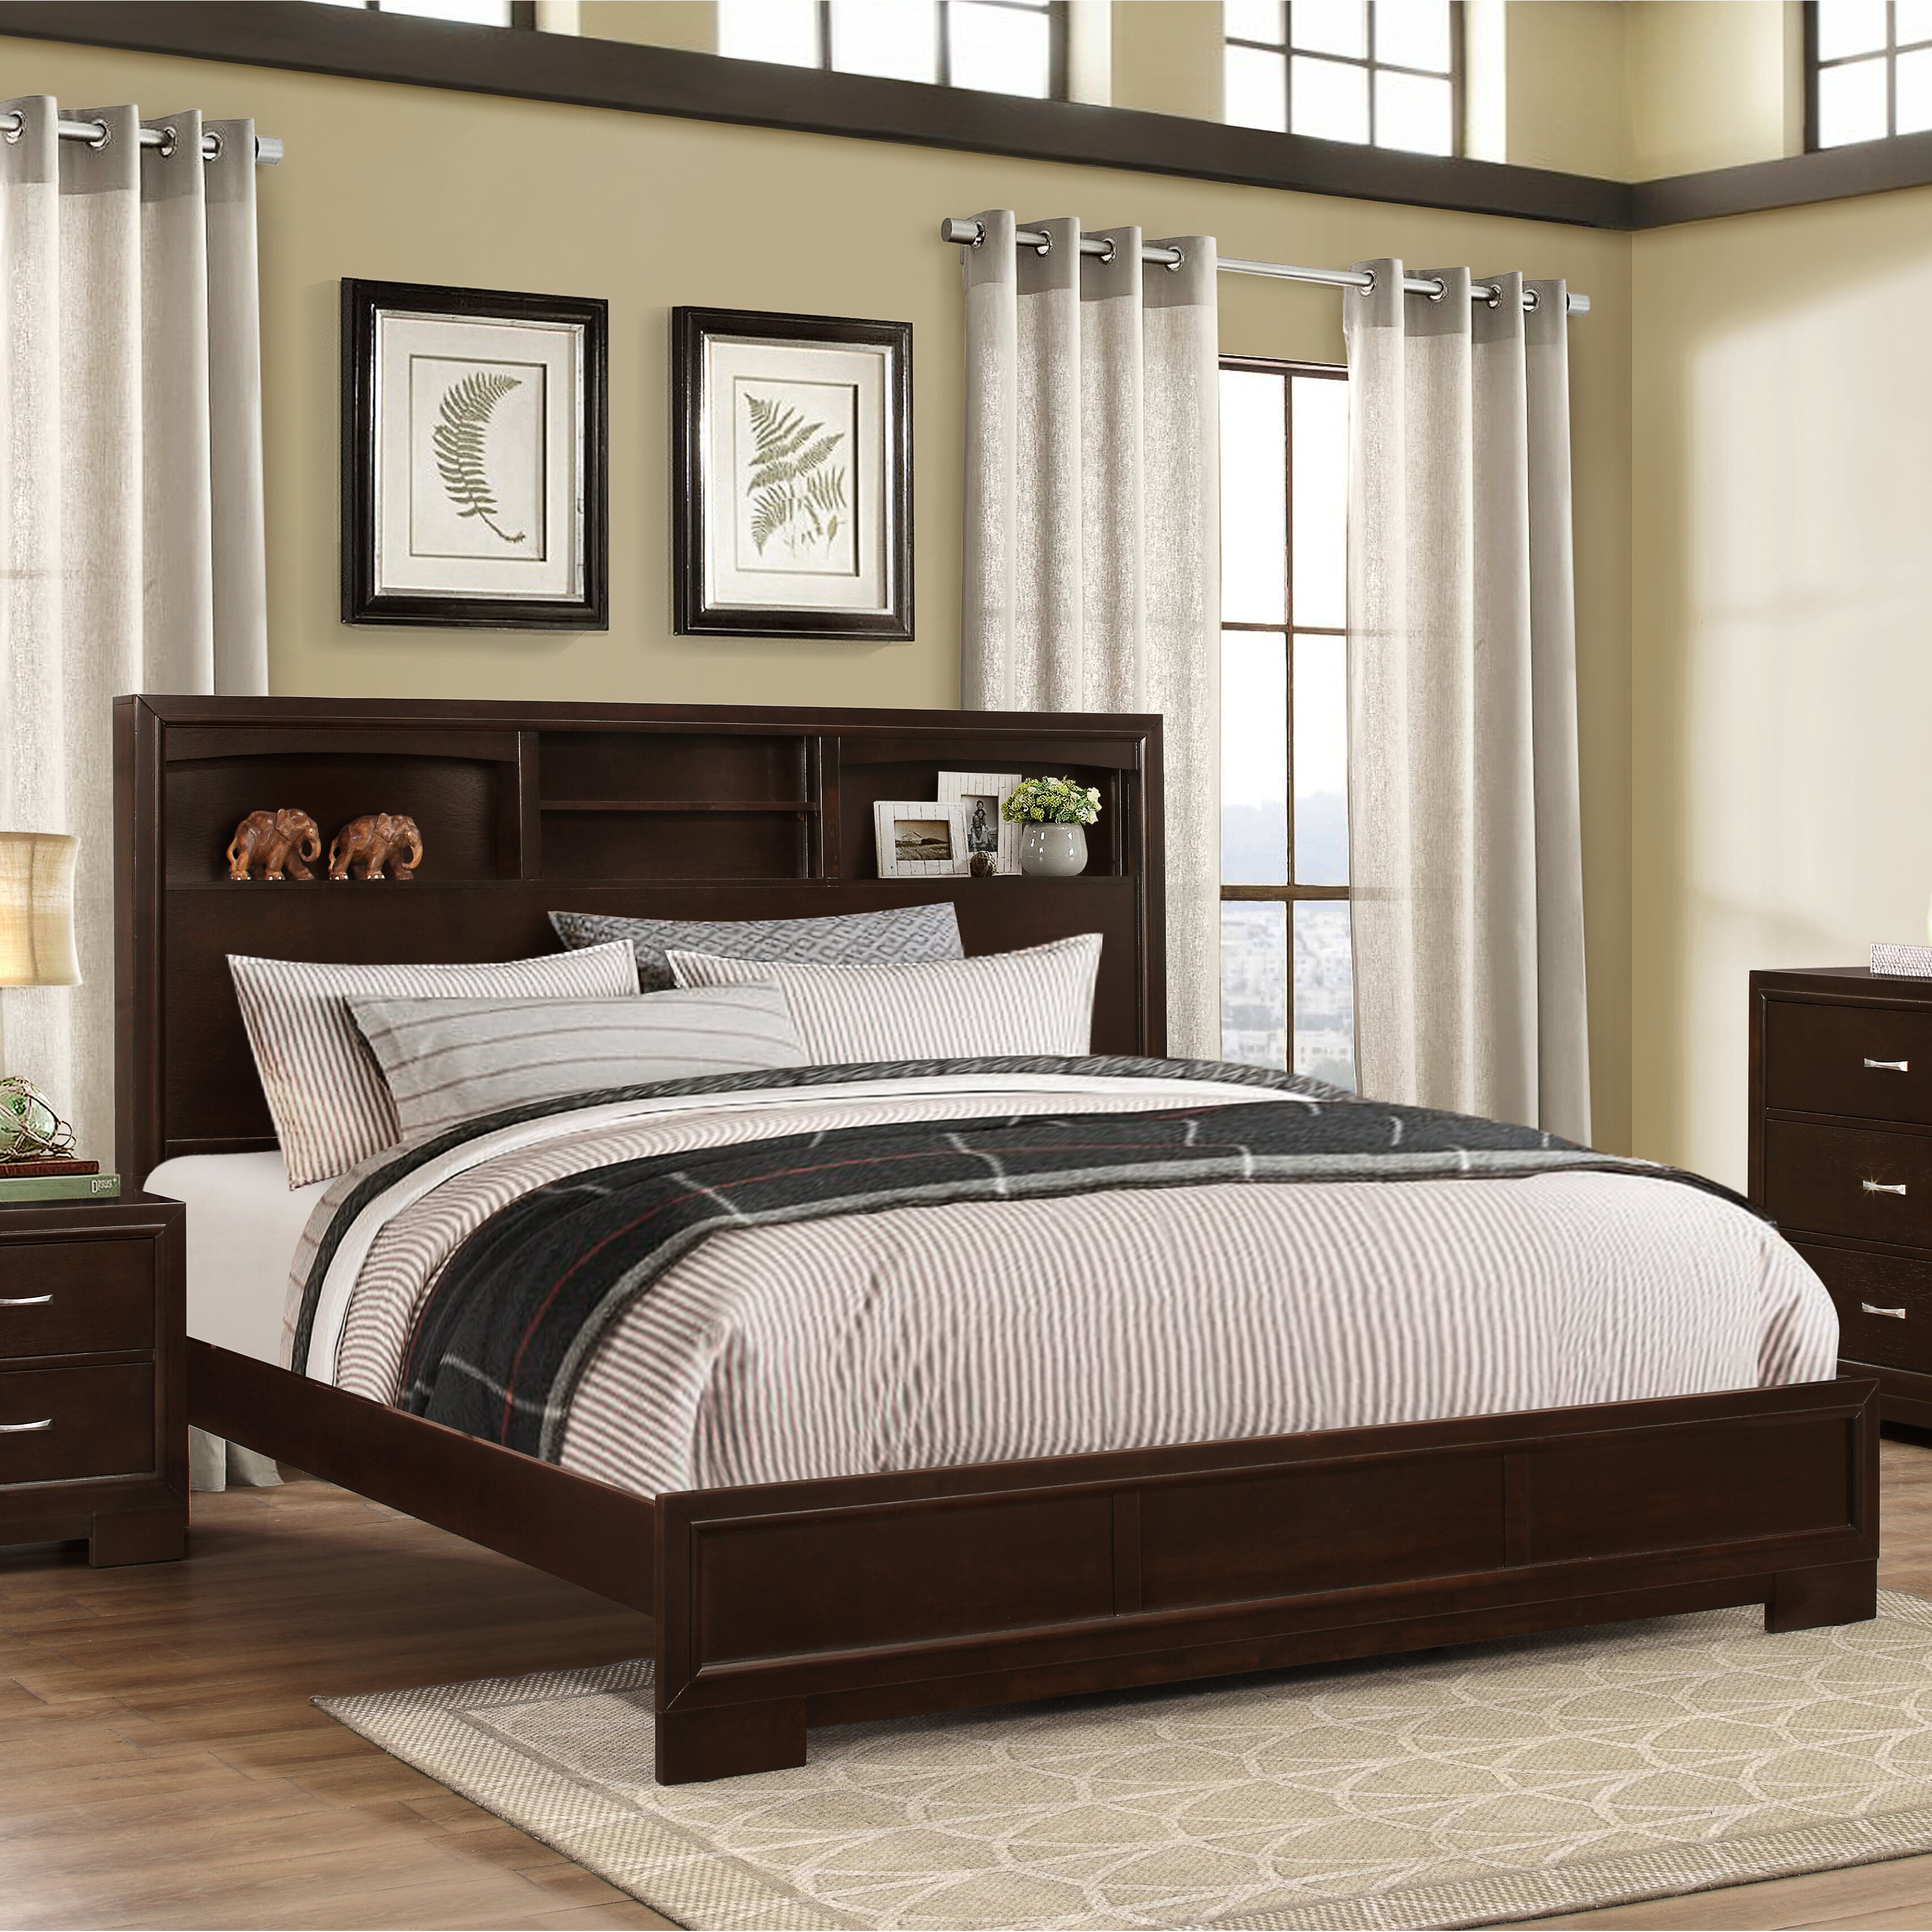 Bedroom furniture names - Names Of Bedroom Furniture Pieces 26 Bedroom Set Names Bedroom Door Names Bedroom Furniture Attractive